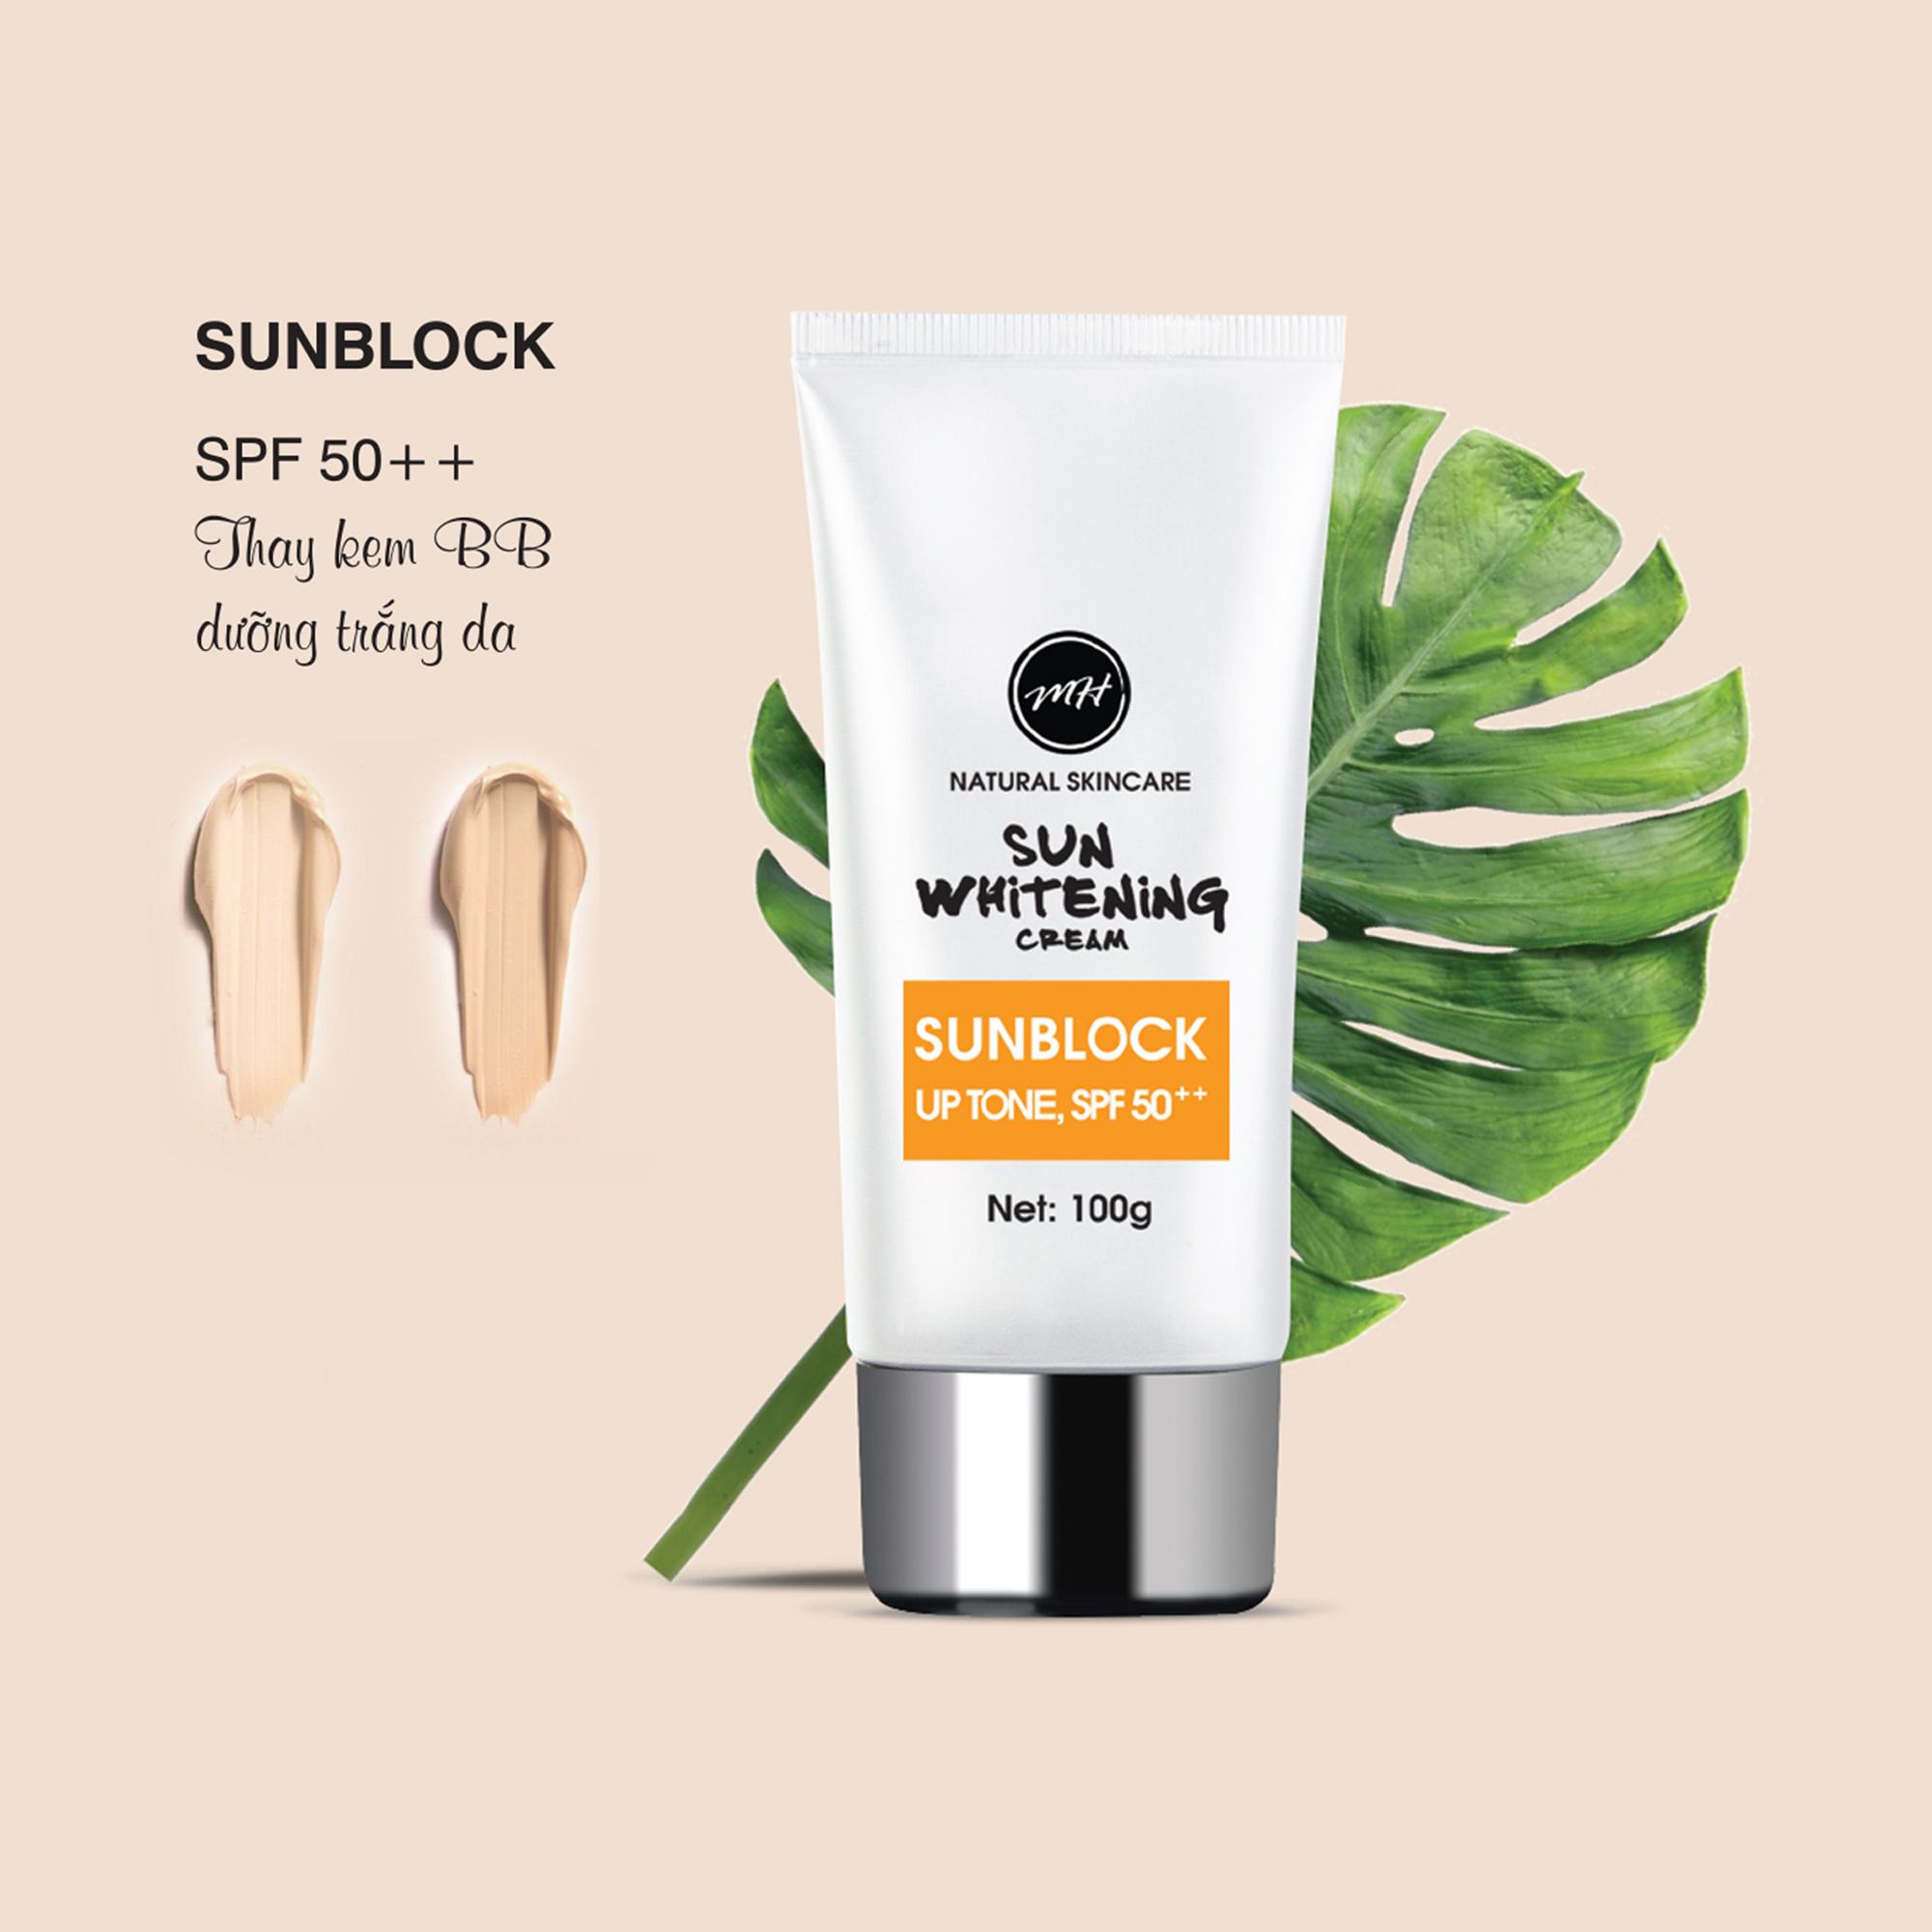 Kem chống nắng  Sun whitening cream - Sunblock SPF50++, UPTONE